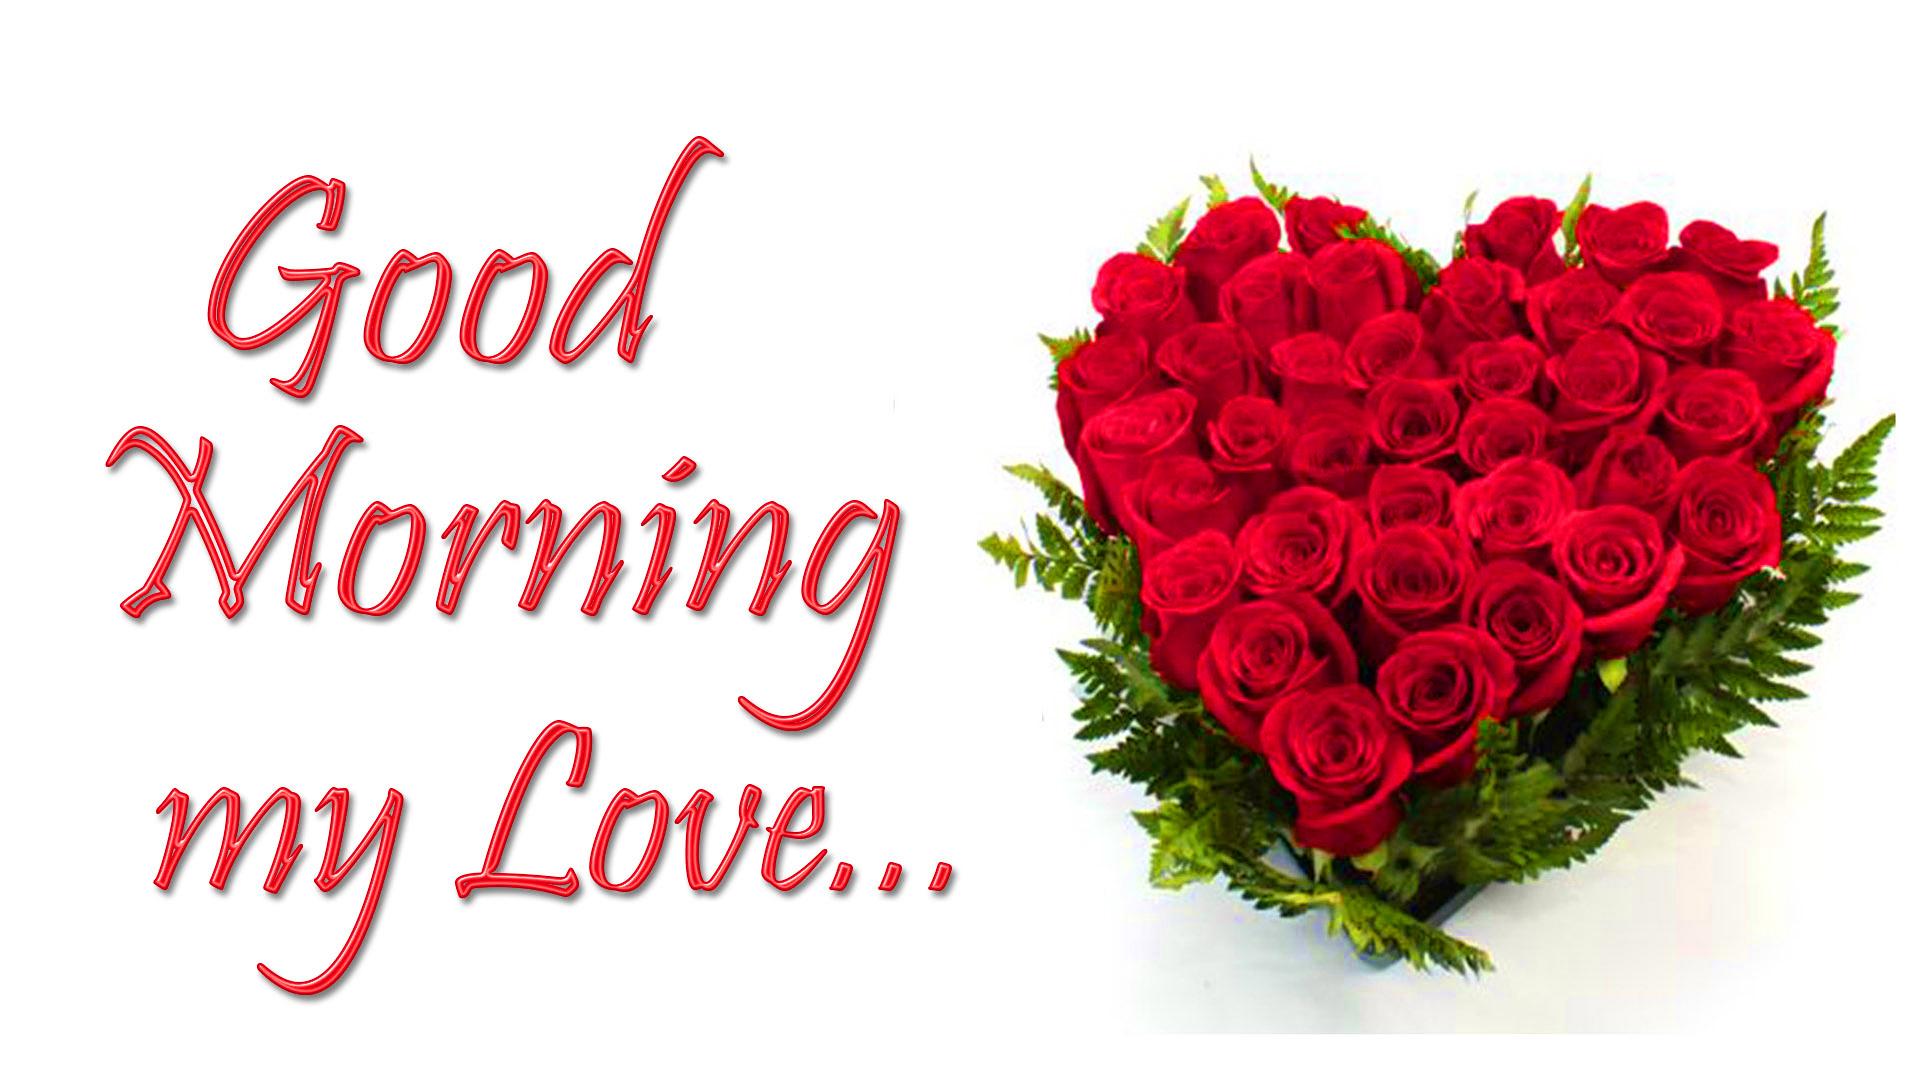 Flower Good Morning Images Wallpaper Pics Download Good Morning